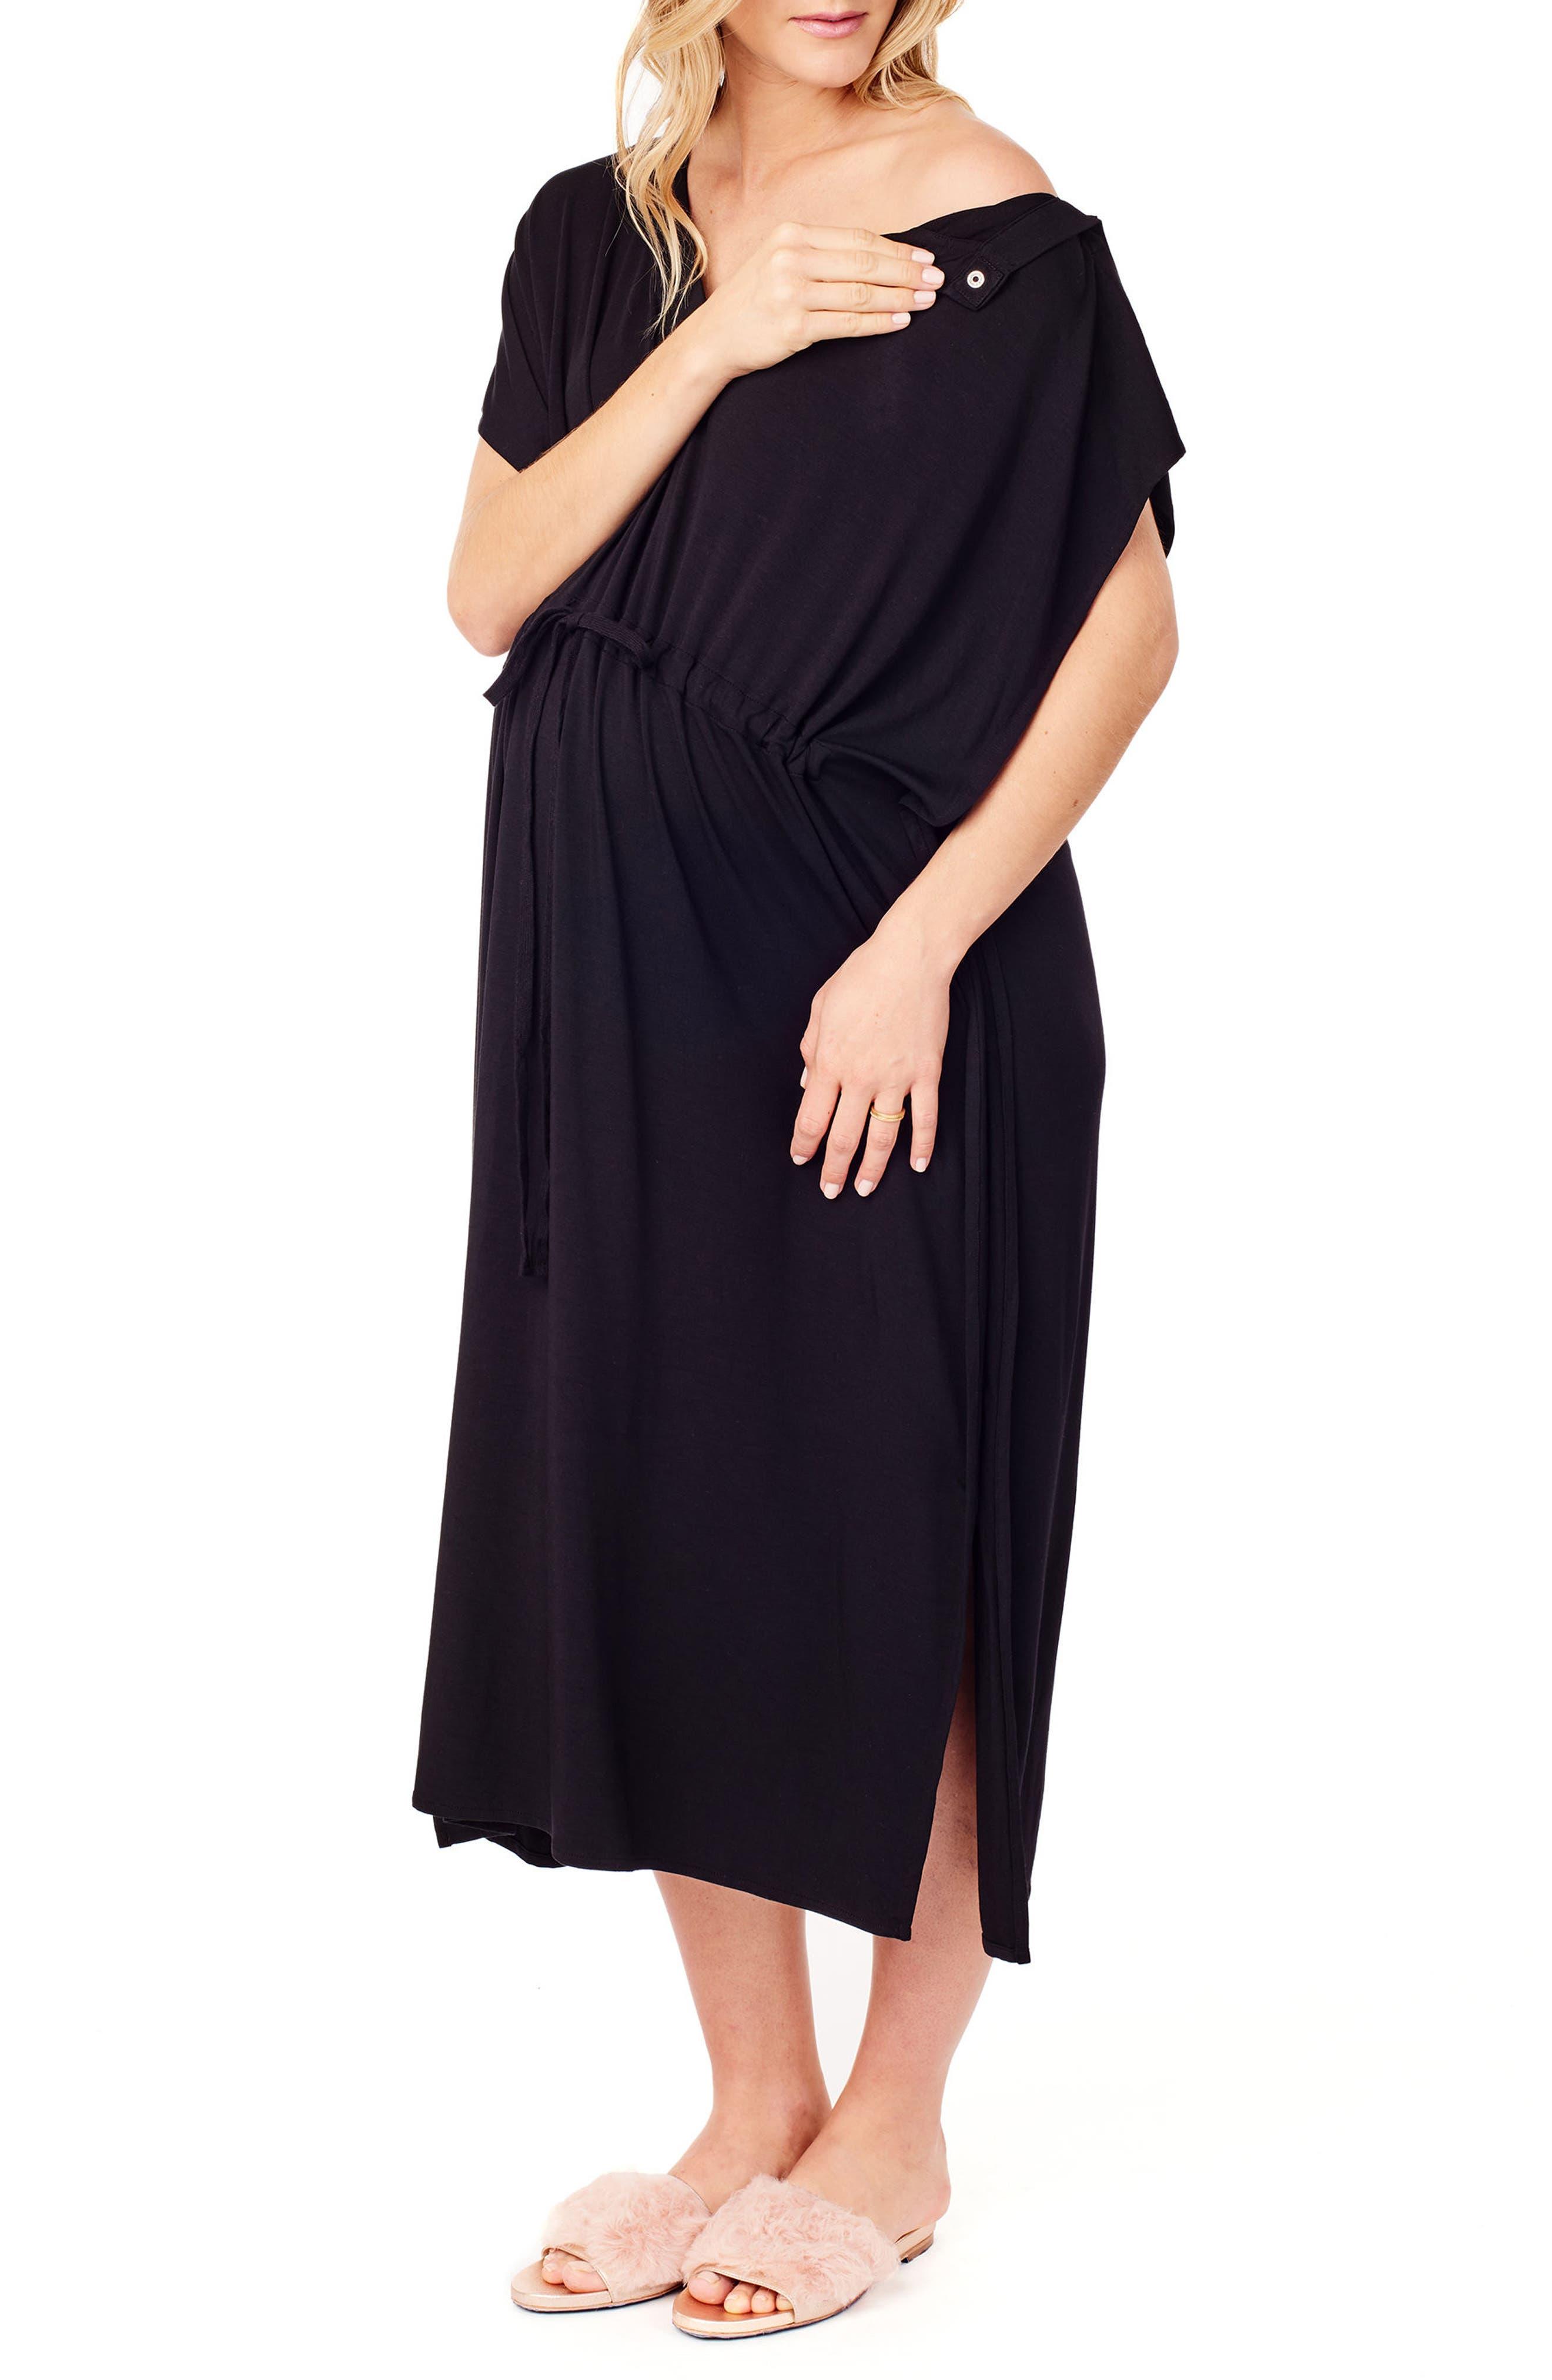 x James Fox & Co. Maternity/Nursing Hospital Gown,                             Alternate thumbnail 4, color,                             Jet Black